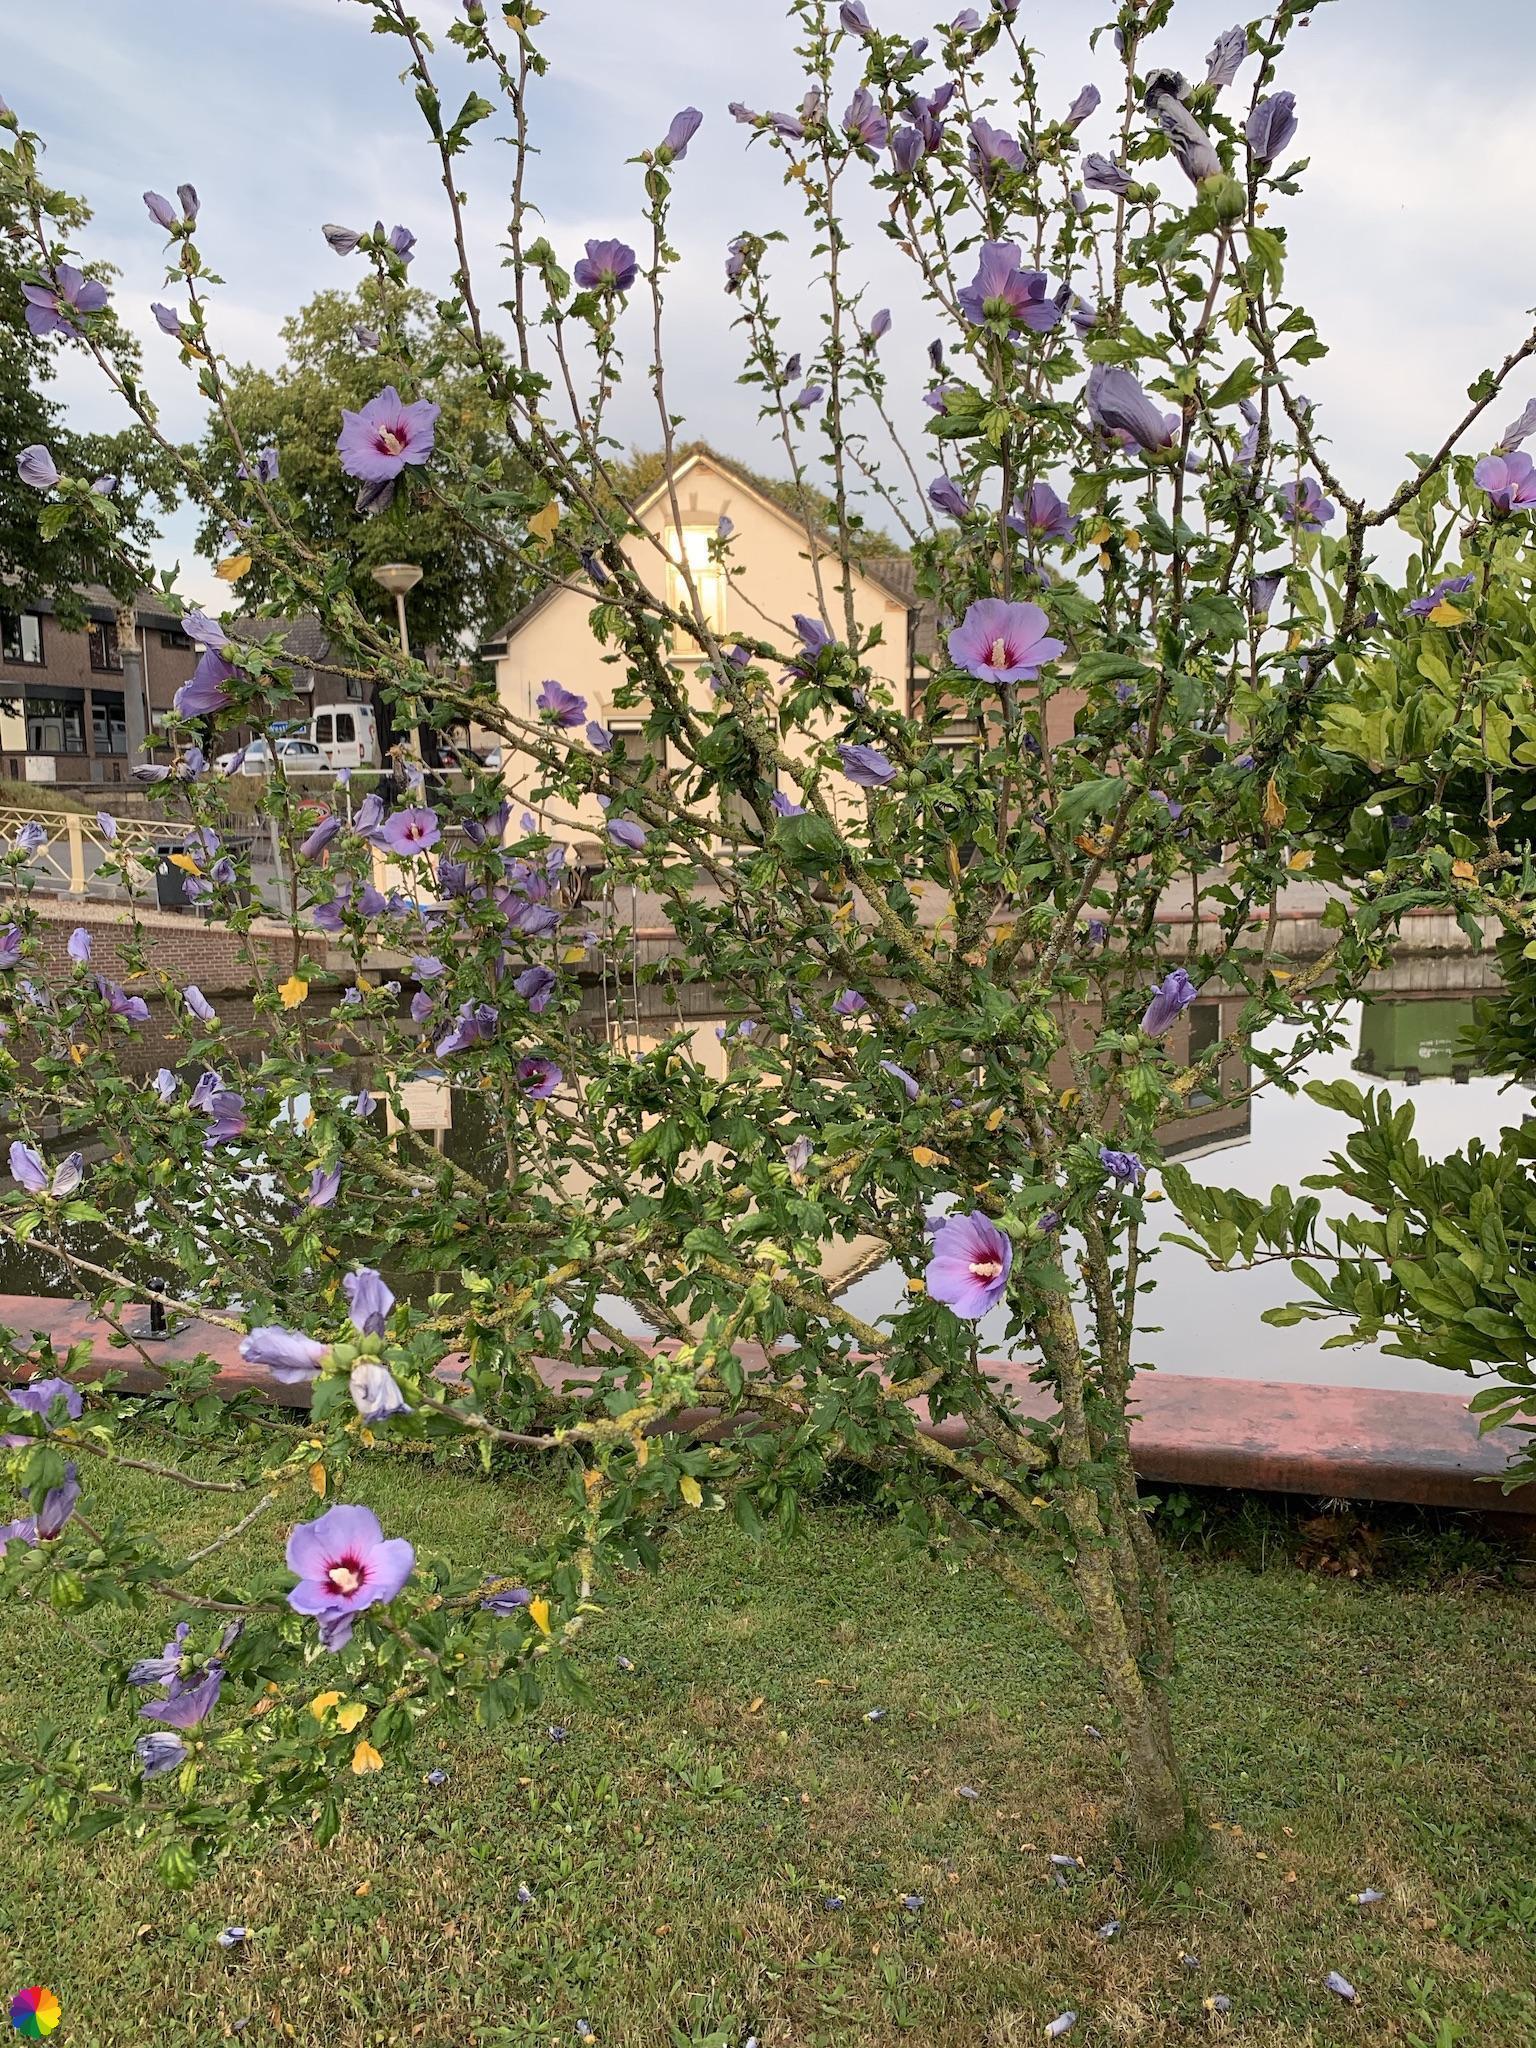 Prachtig bloeiende boom